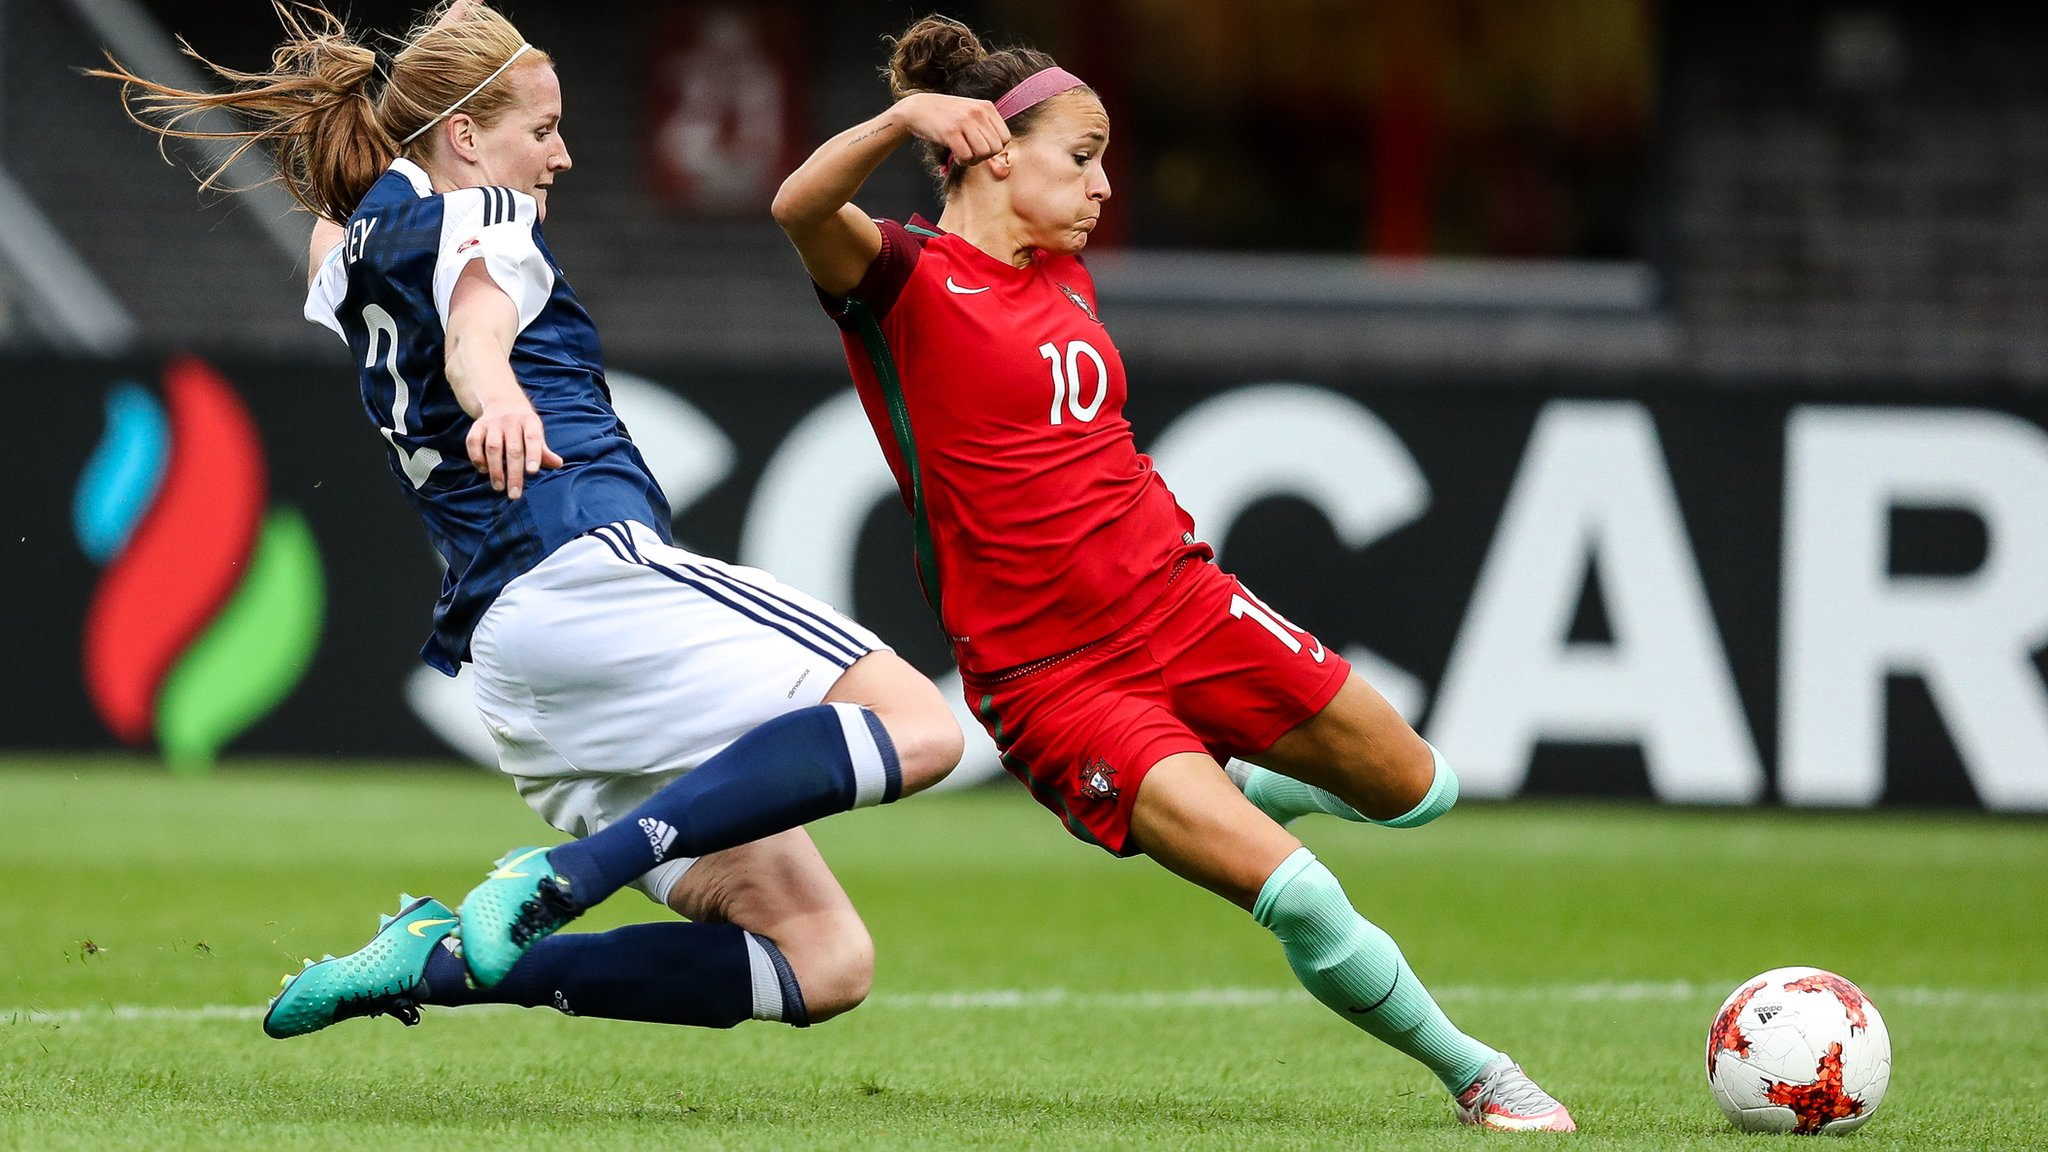 Scotland's Euro 2017 hopes alive despite defeat